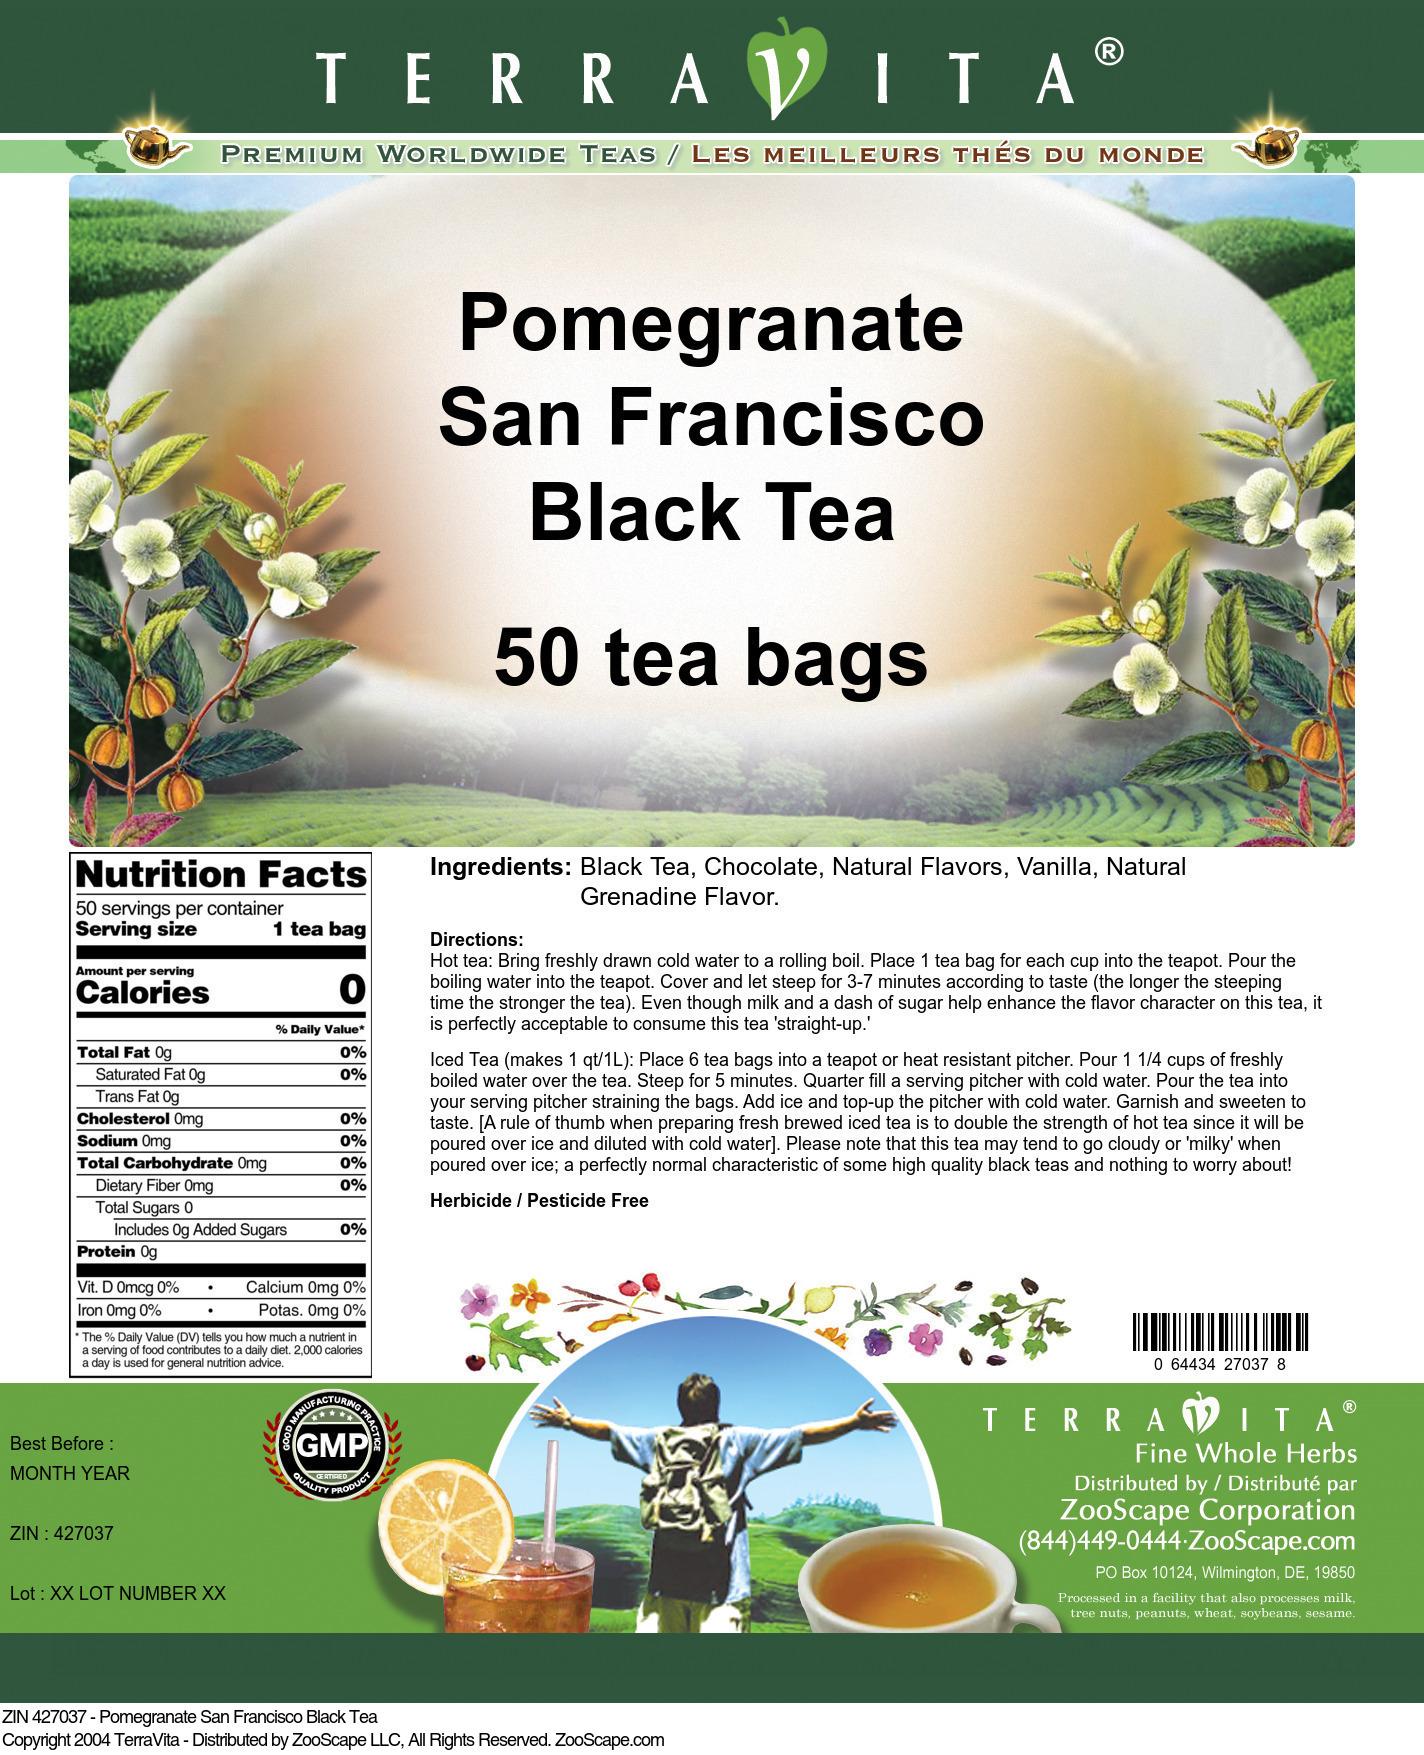 Pomegranate San Francisco Black Tea